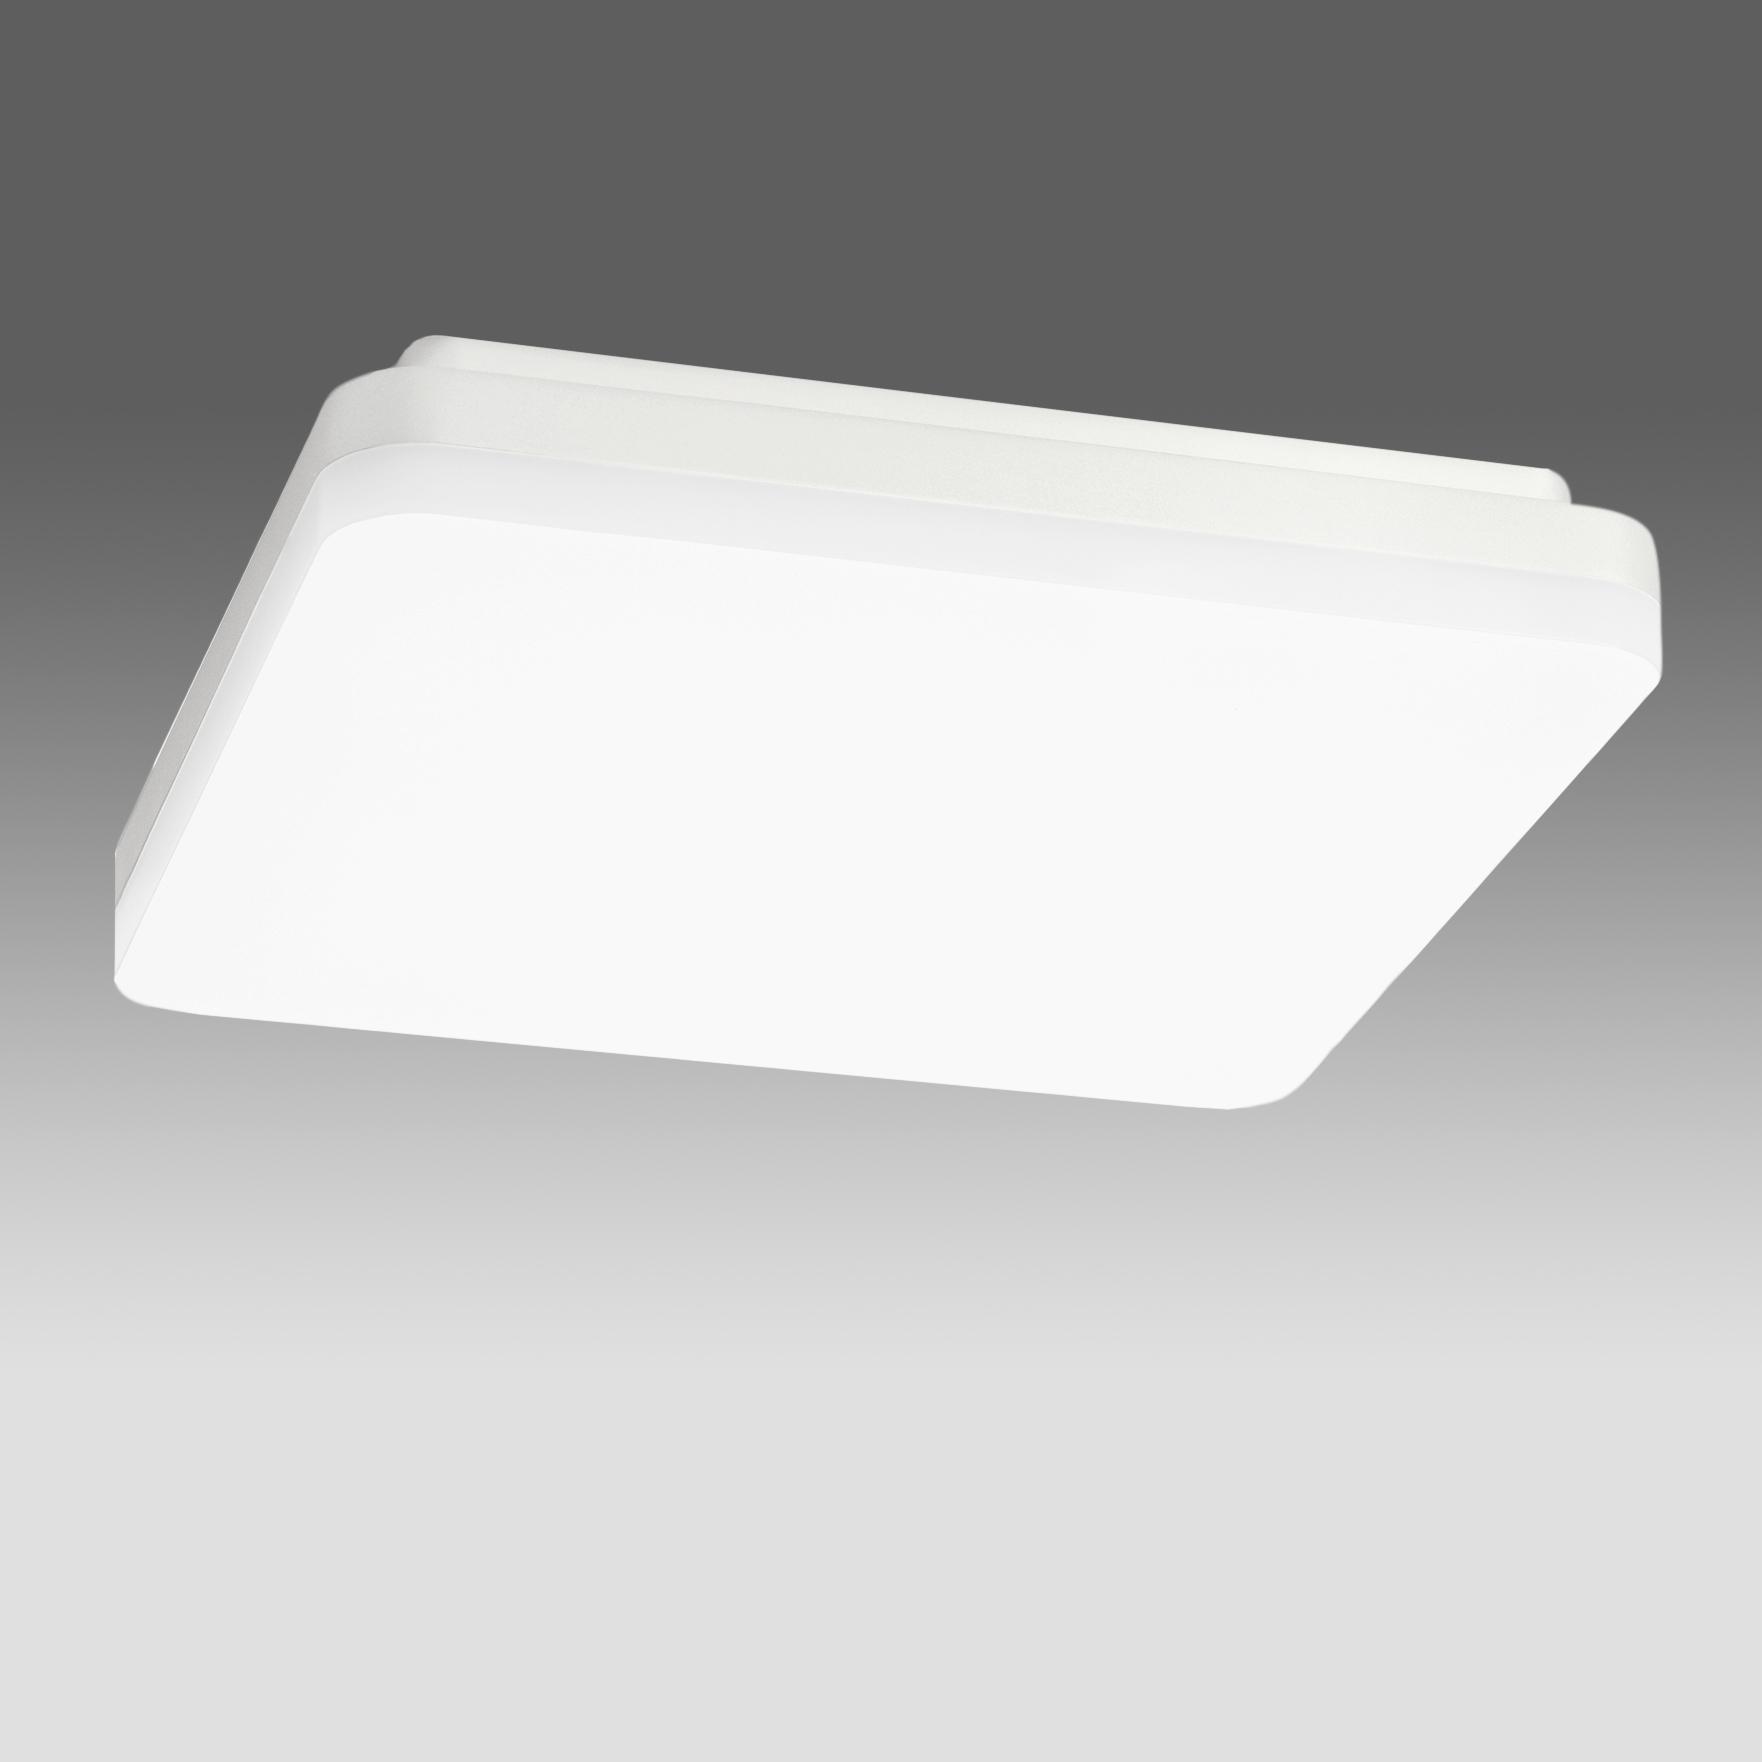 1 Stk Elegance Square III 27W 2800lm 3000K Sensor IP20 weiß LILE0041--